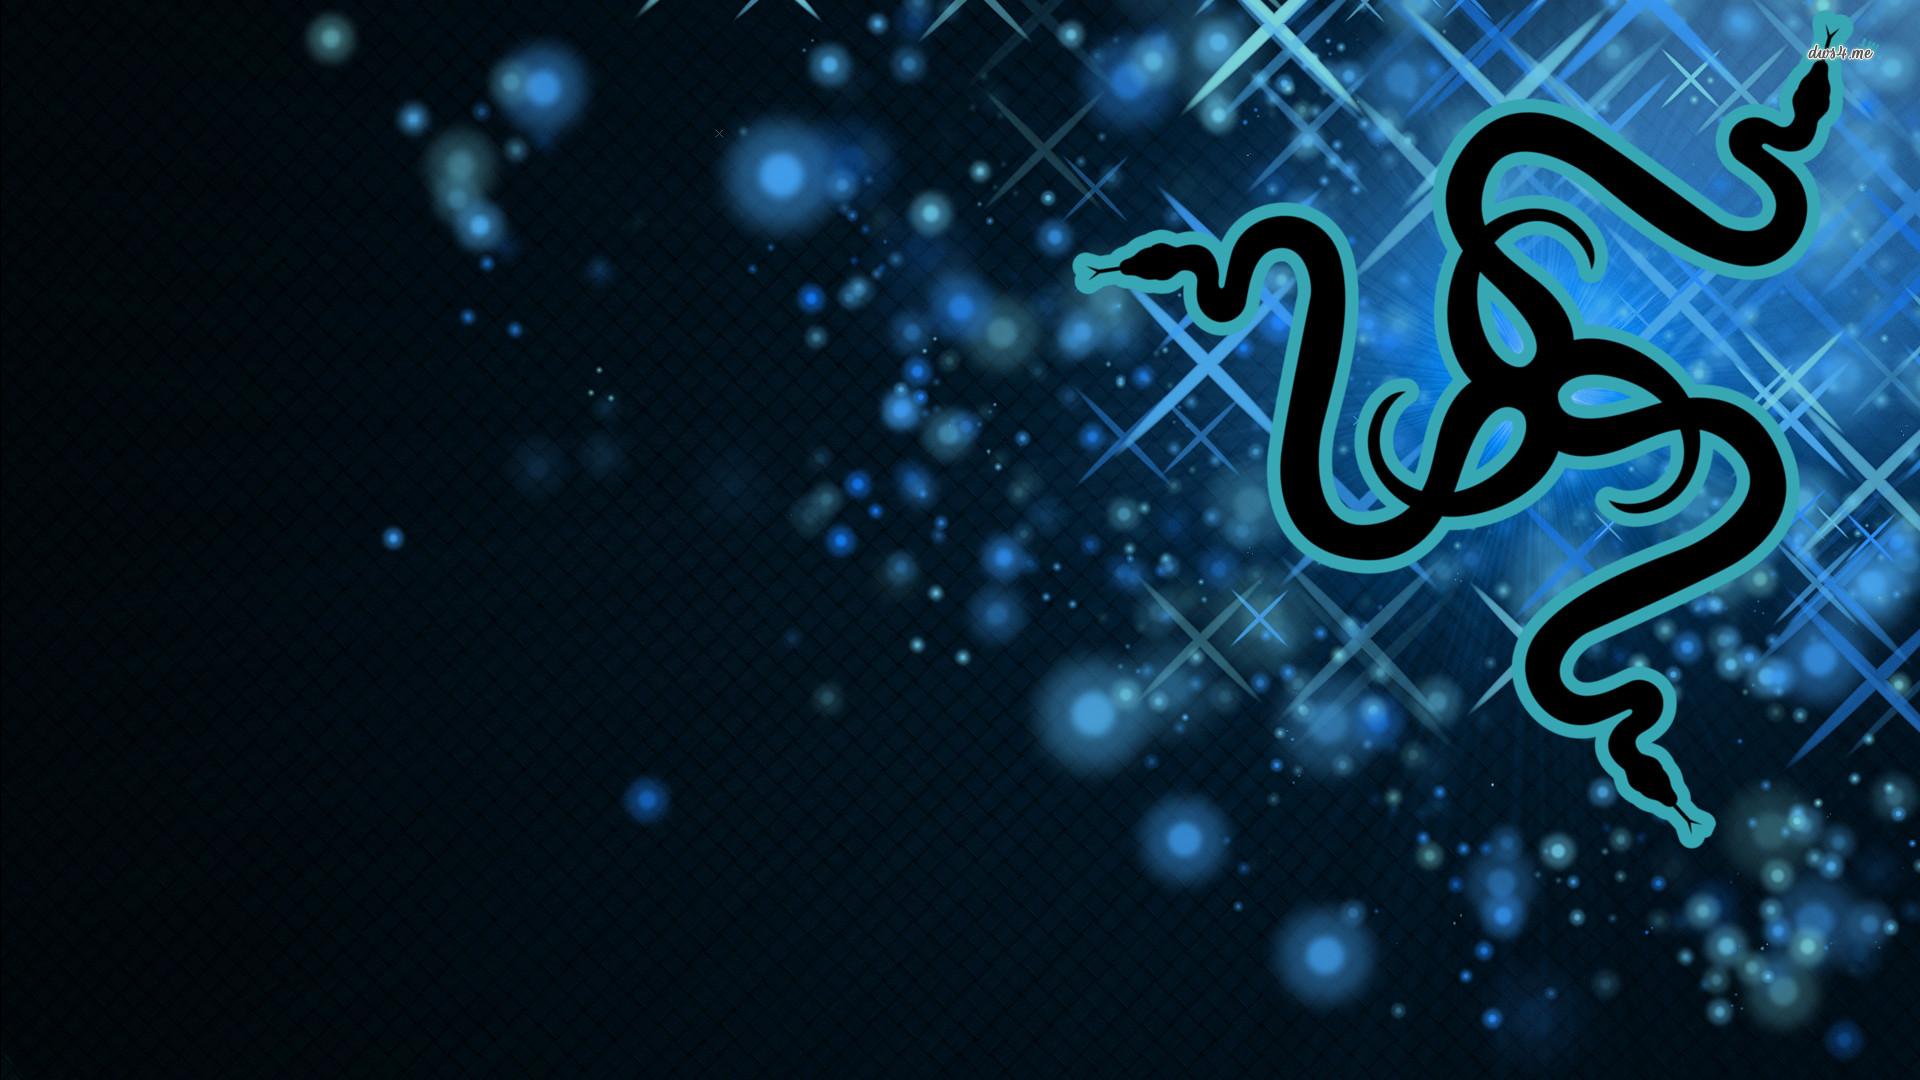 <b>Blue Razer</b>